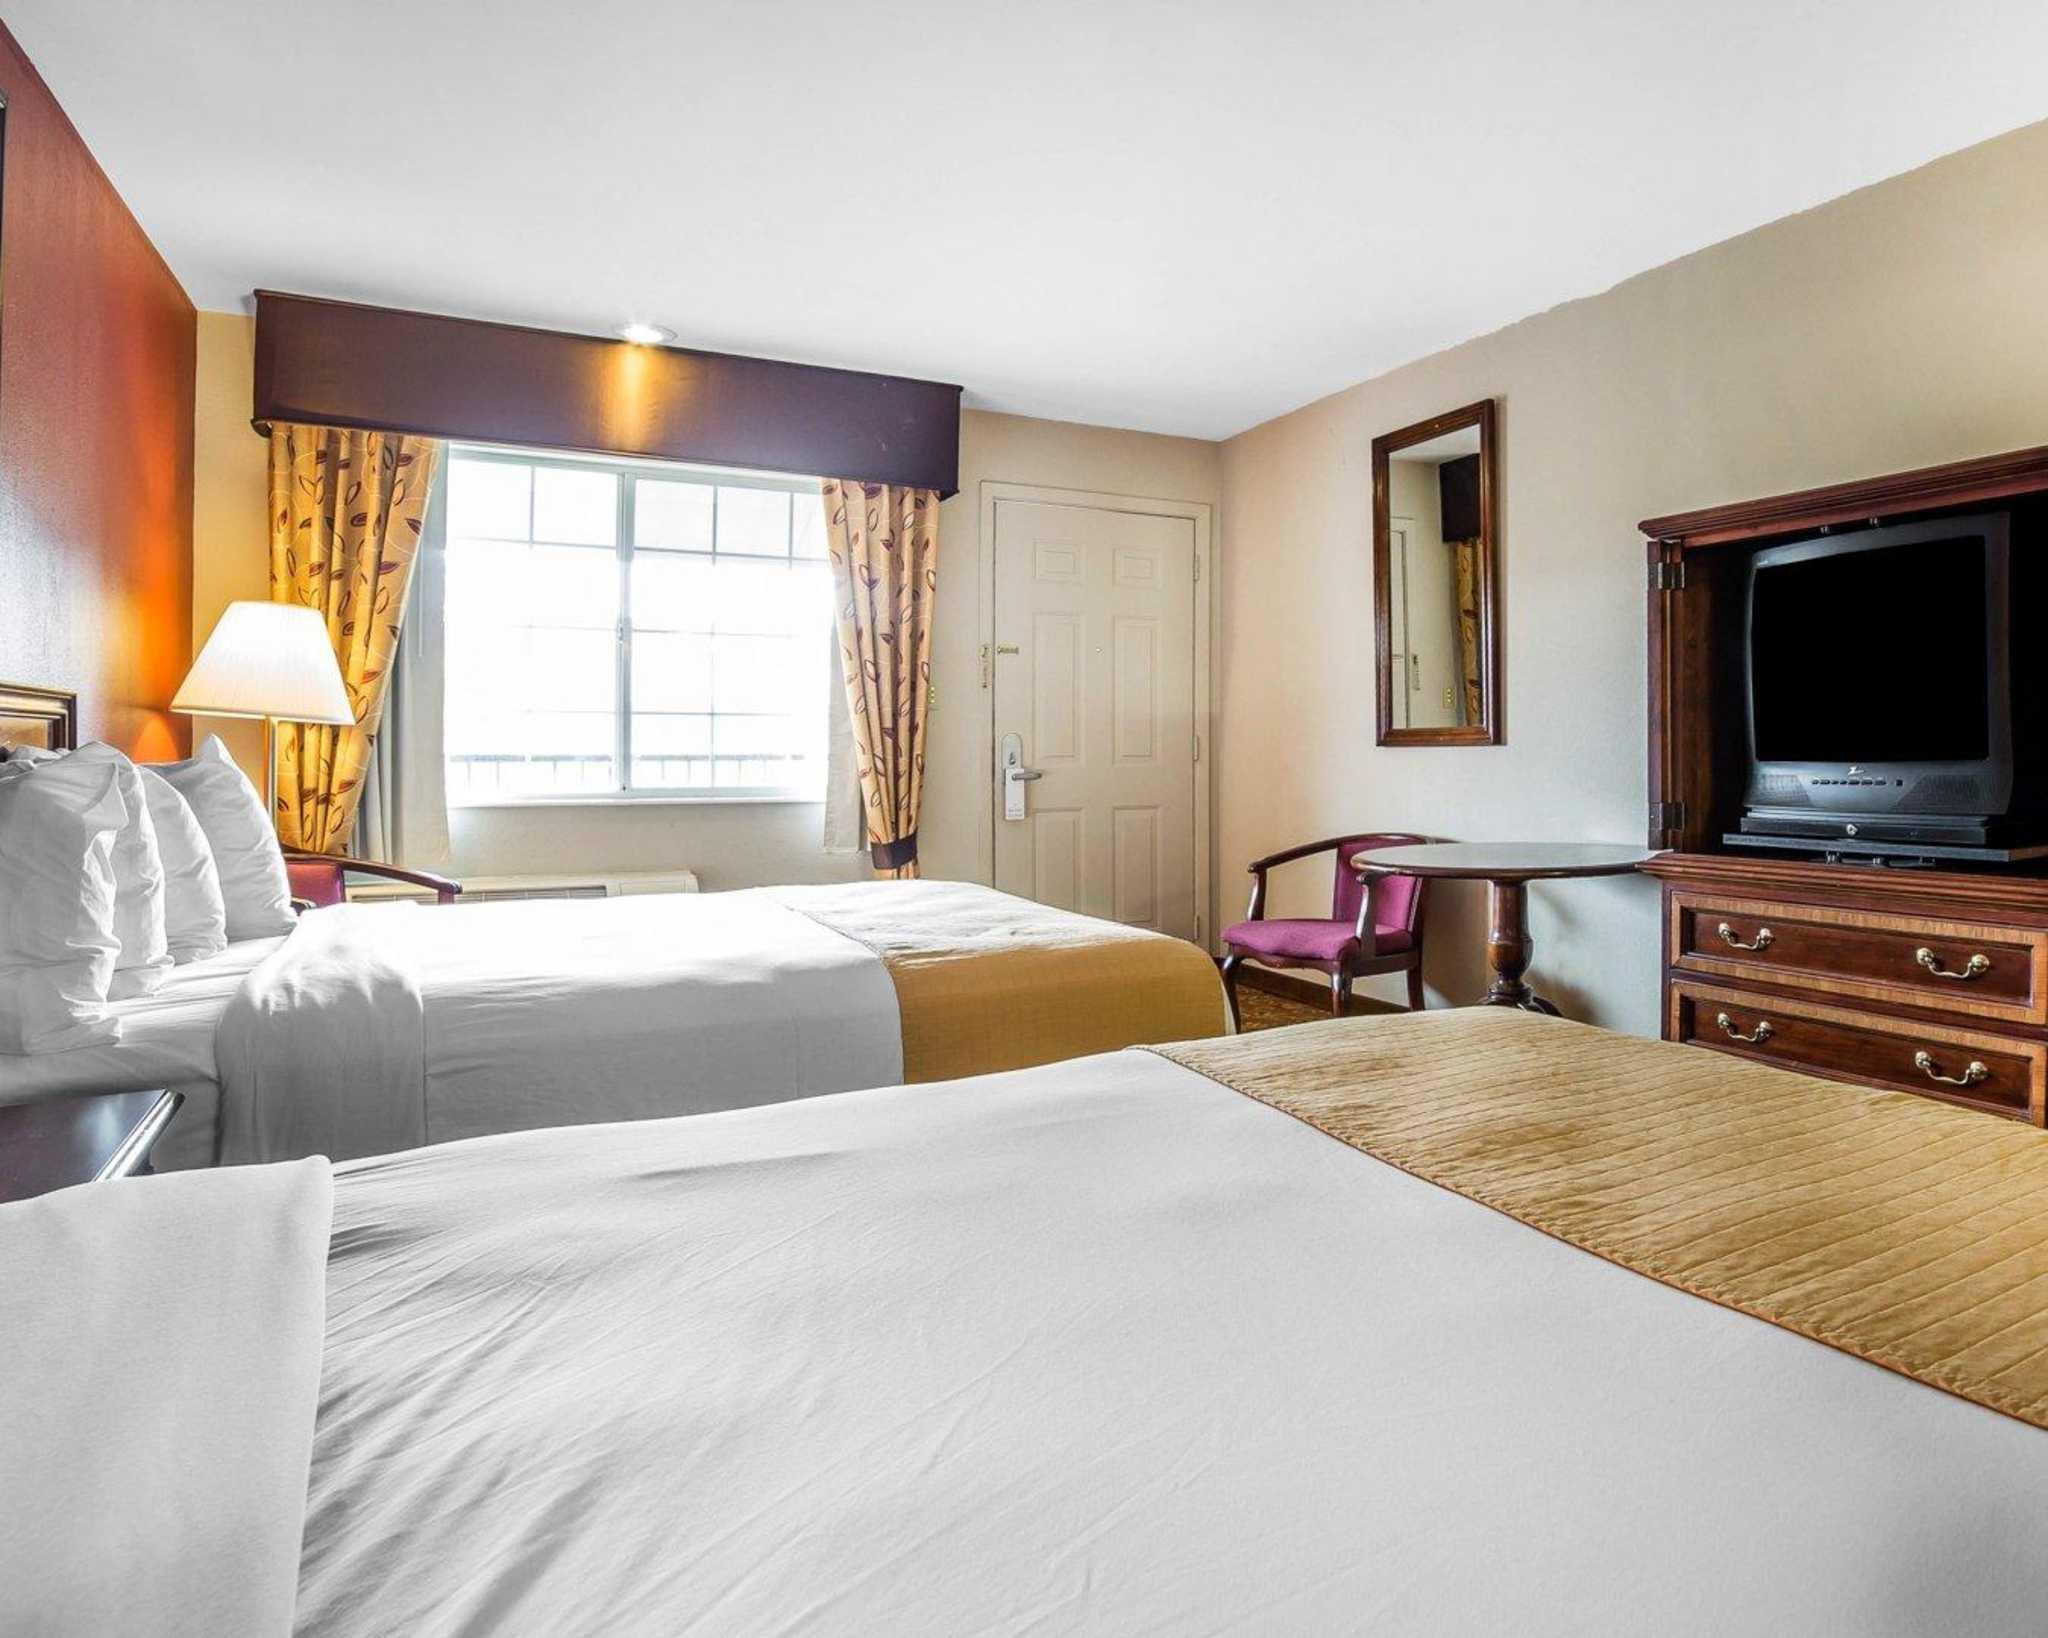 Quality Inn & Suites Minden US-395 image 5